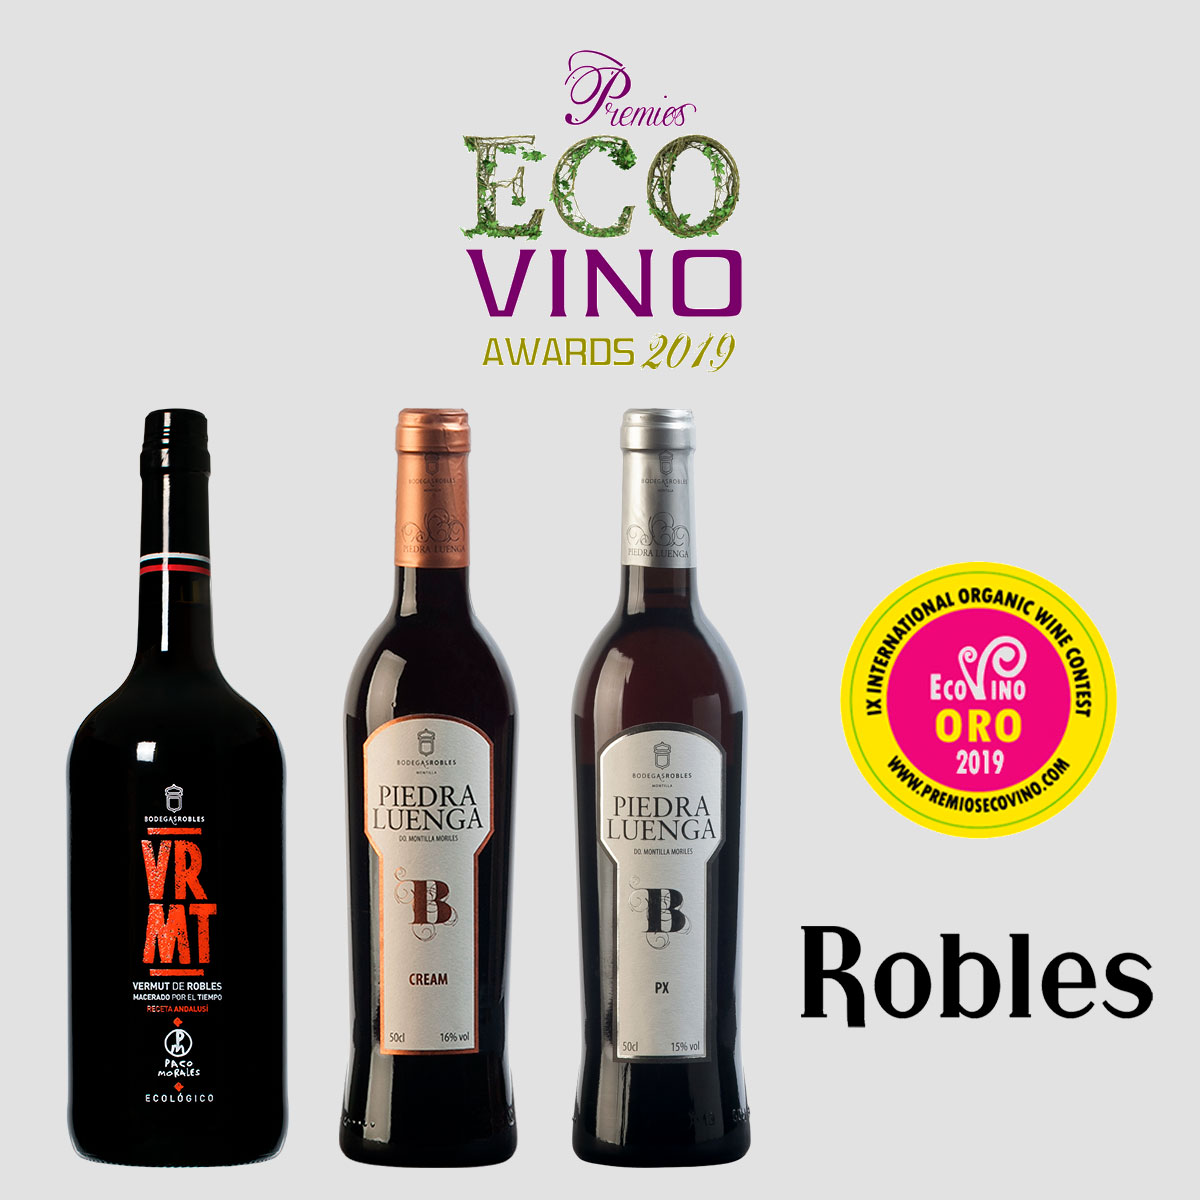 Nuevo reconocimiento en Ecovino (La Rioja)